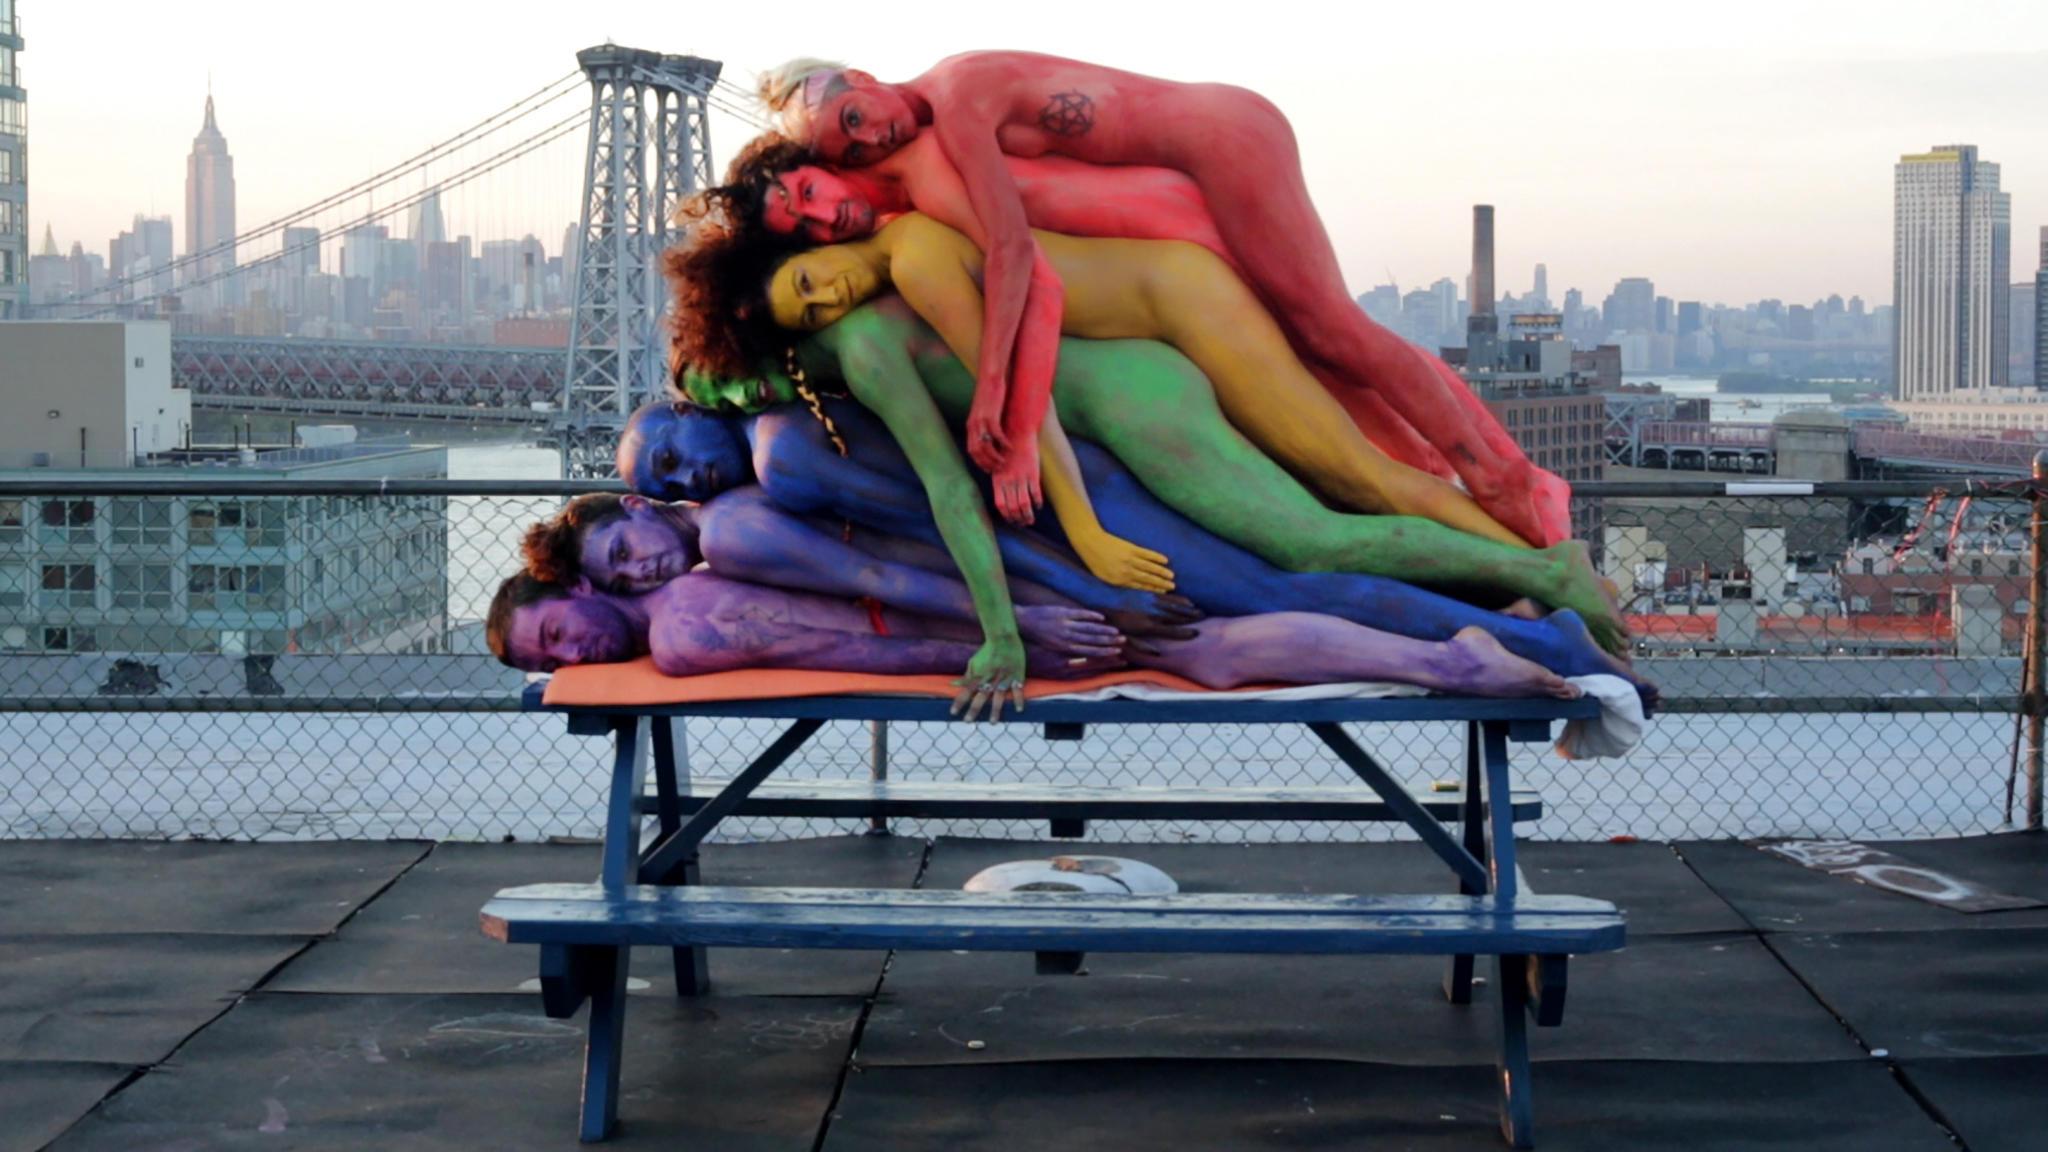 Melanie Bonajo, Night Soil – Economy of Love, 2015. Courtesy the artist and AKINCI, Amsterdam